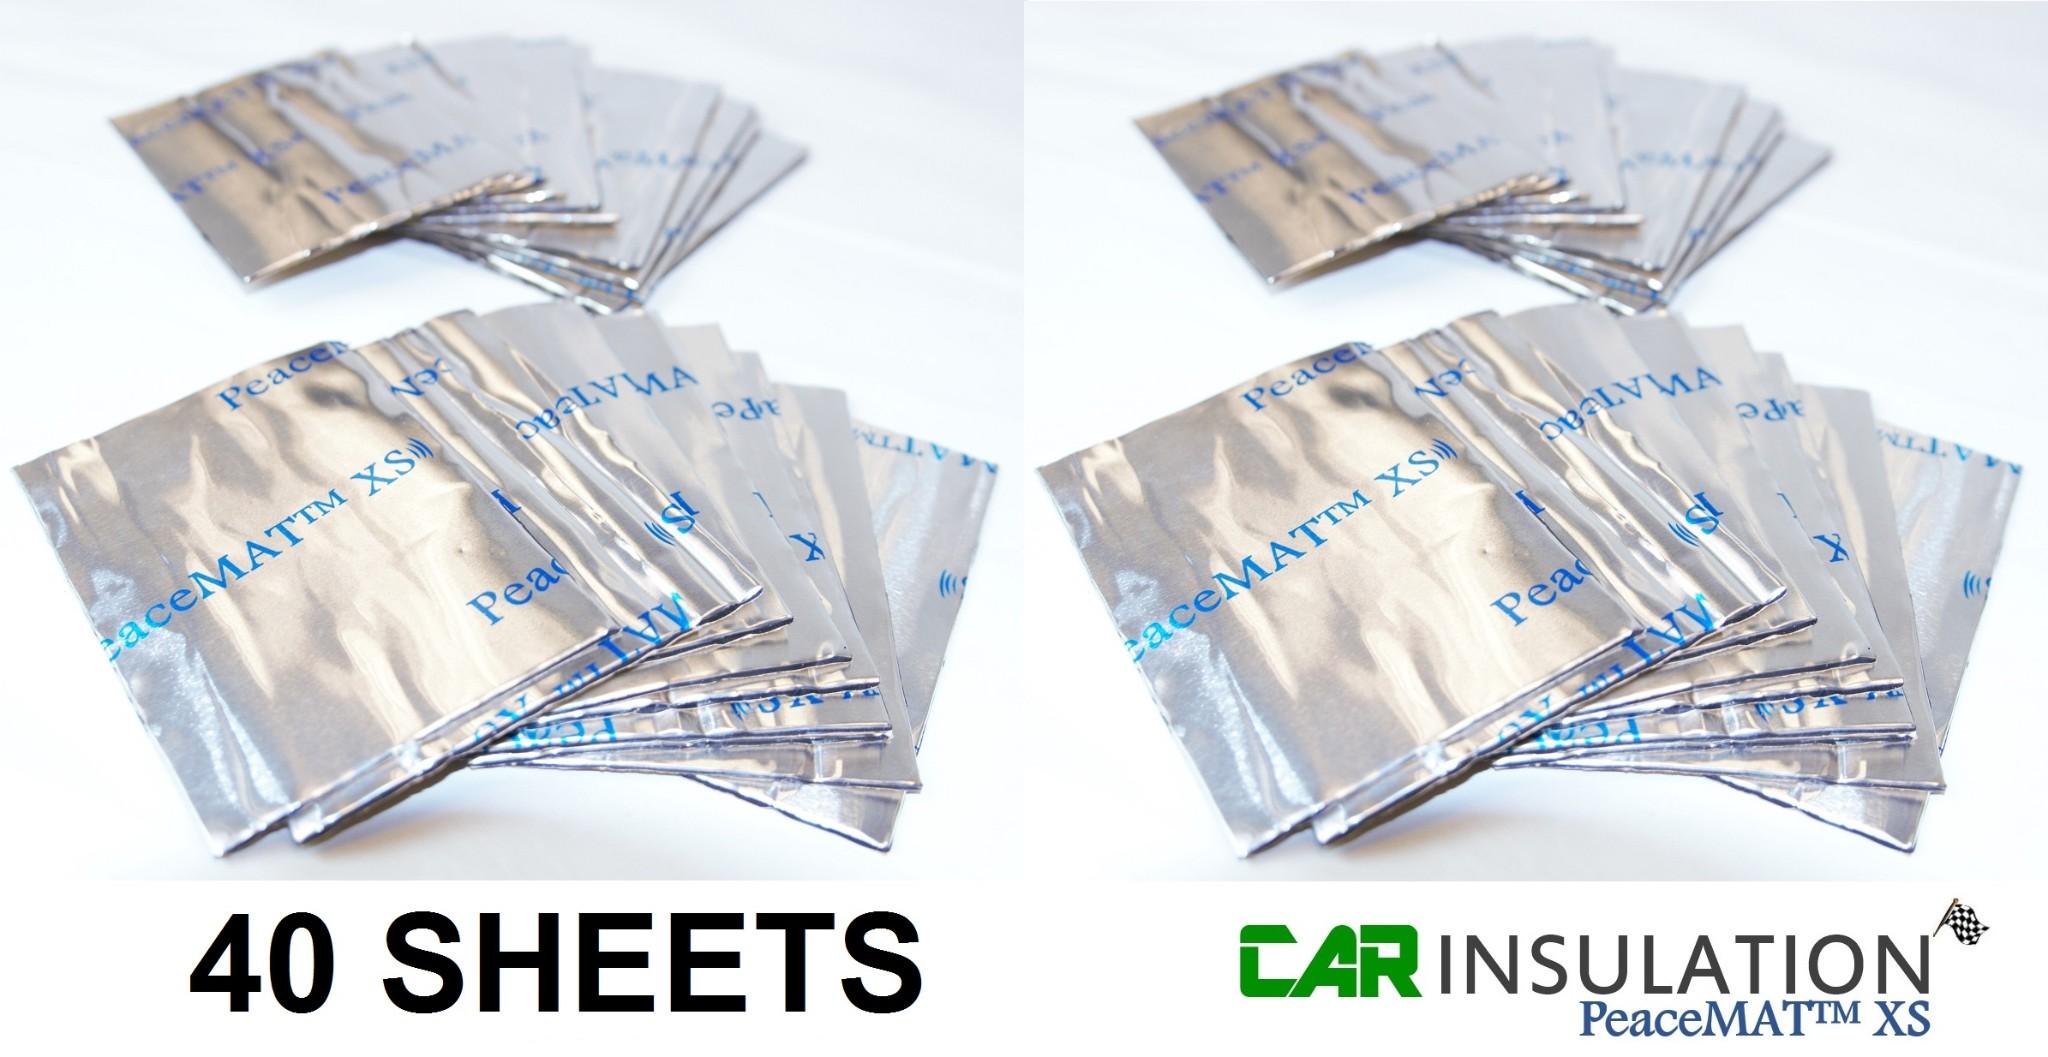 Anti Panel Vibration Vehicle Panel Deadening 40 Sheets PeaceMAT™ XS